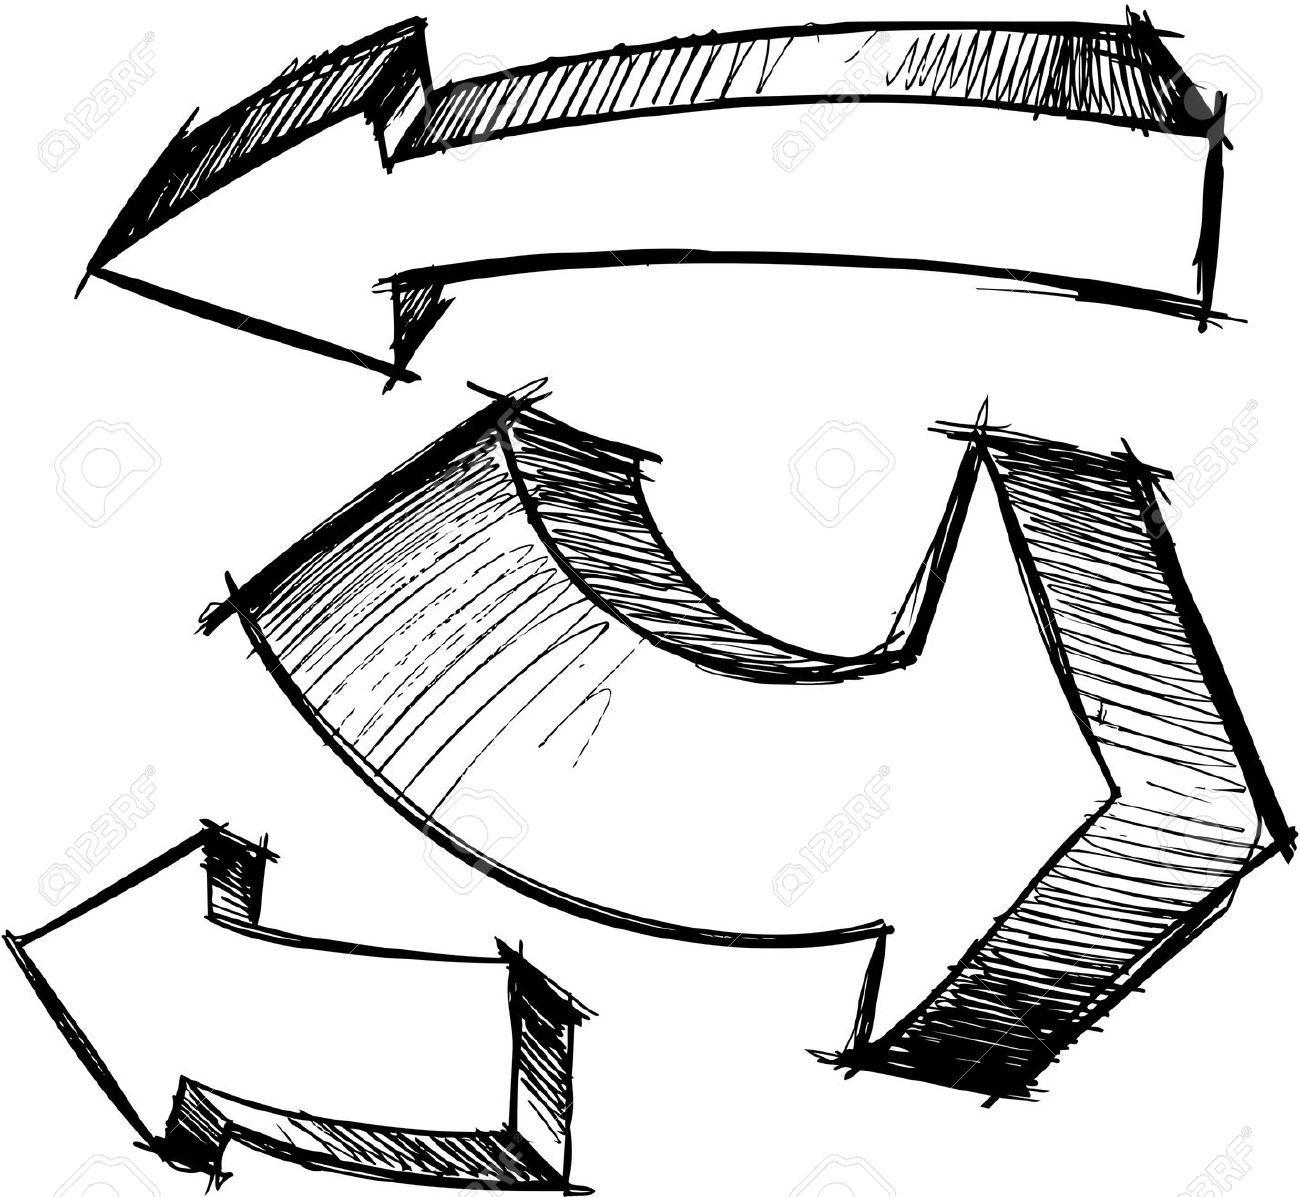 Free doodle arrow clipartpig. Arrows clipart sketch